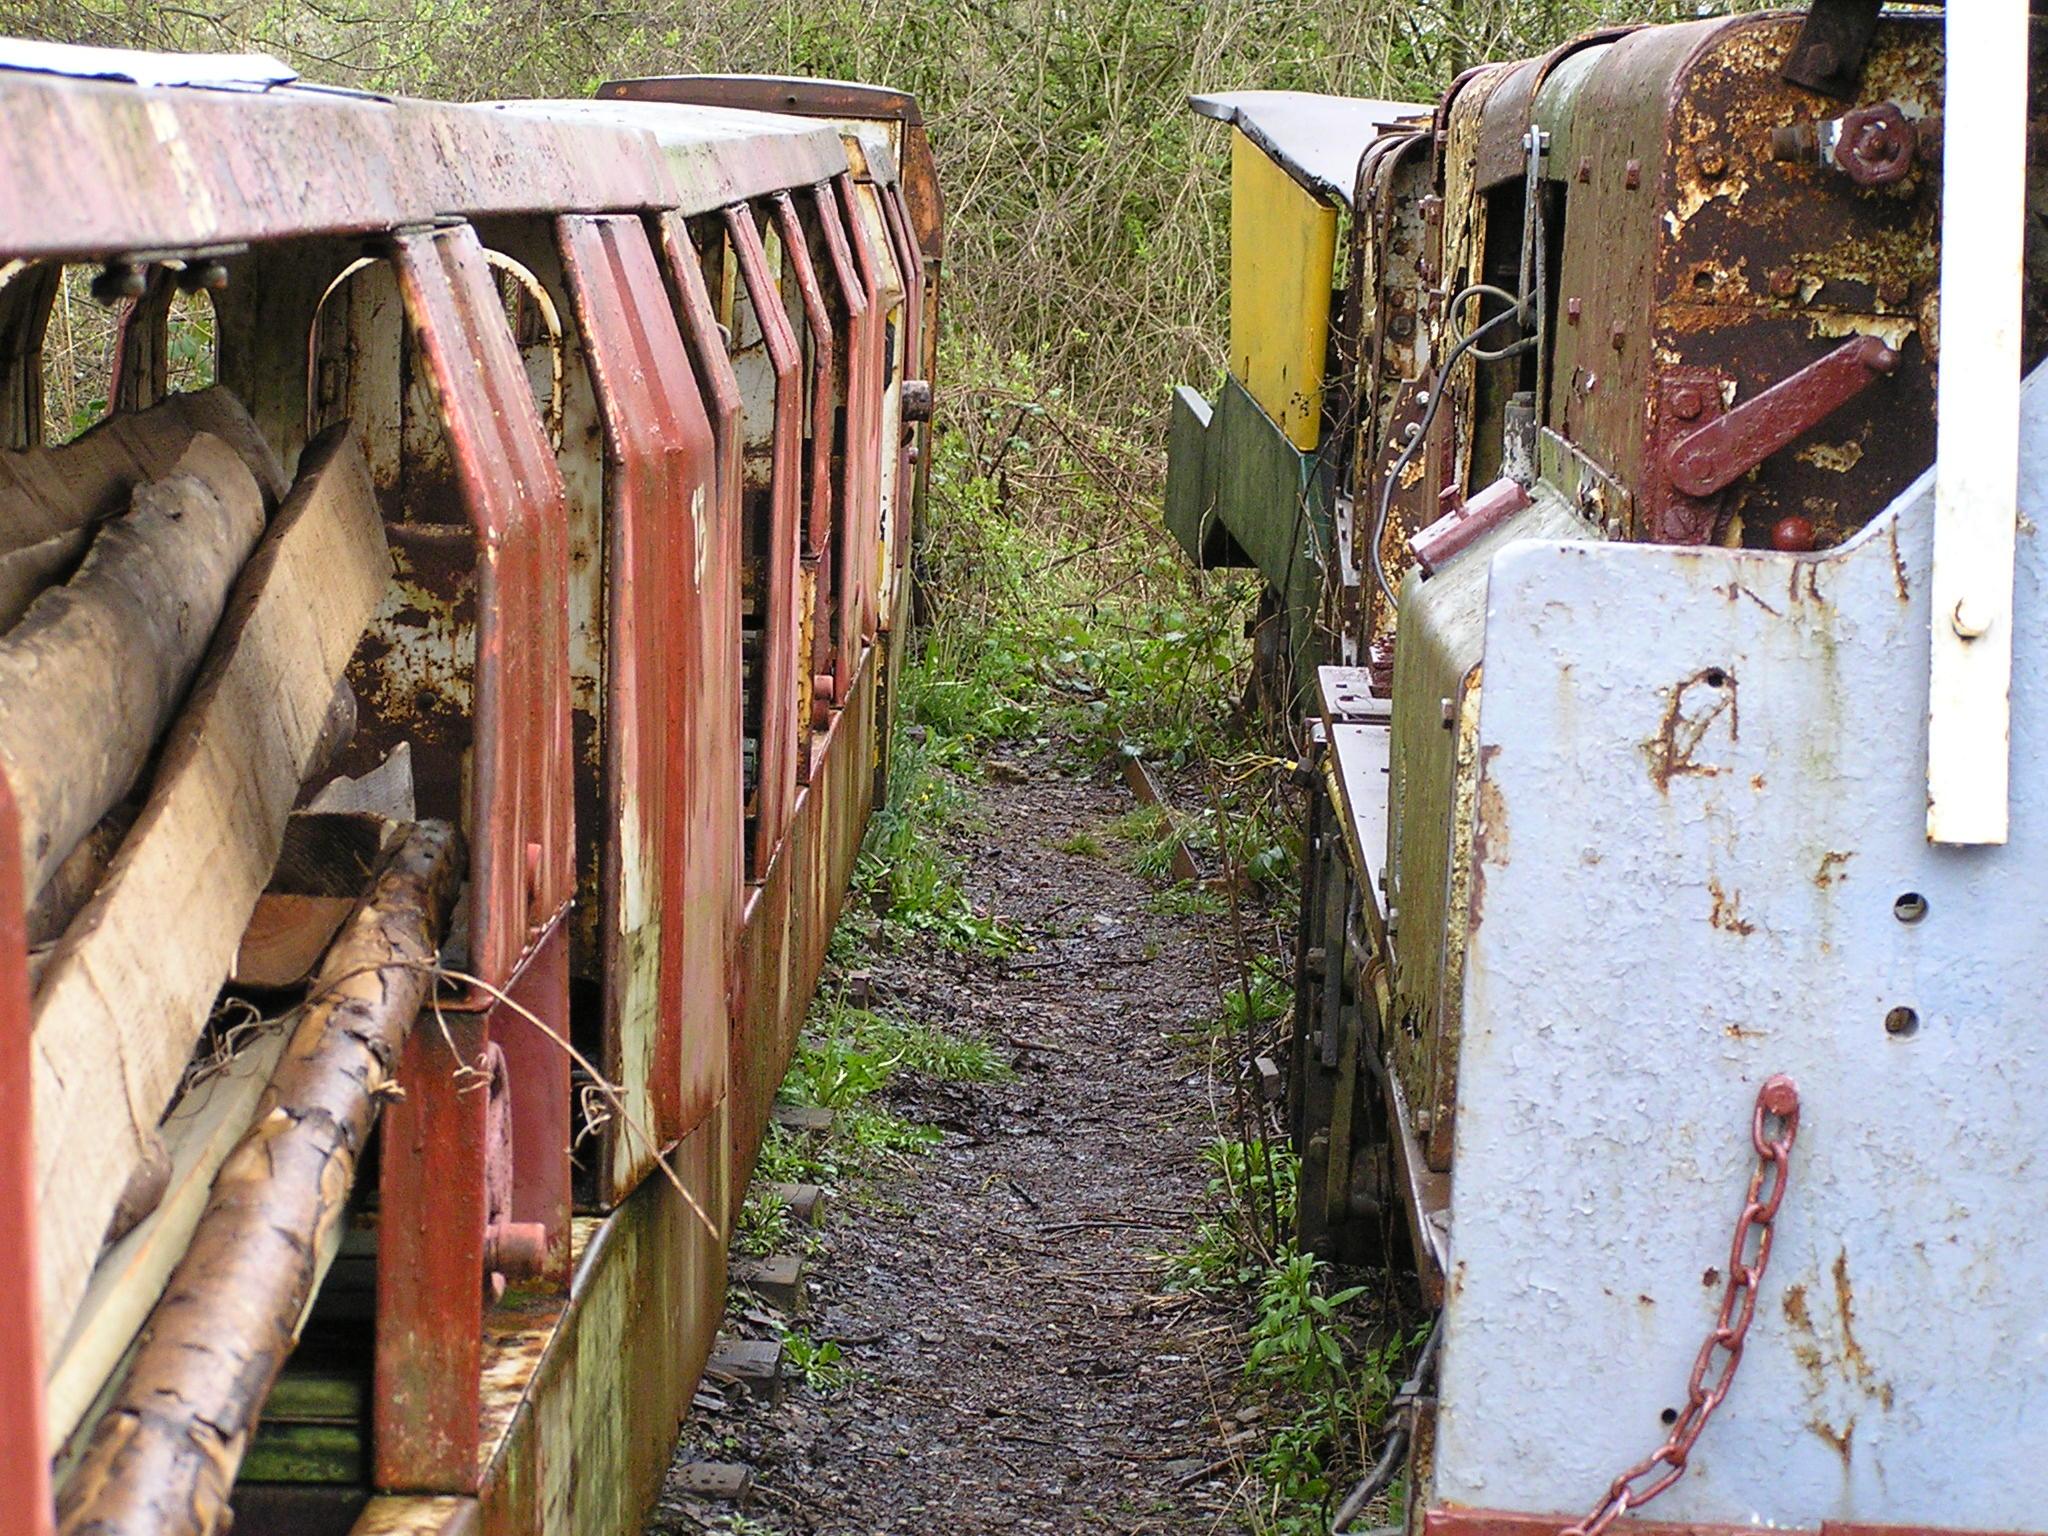 Clearwell United Kingdom  city photos gallery : Description Hudswell Clarke 0 6 0DM mining loco & trucks, Clearwell ...